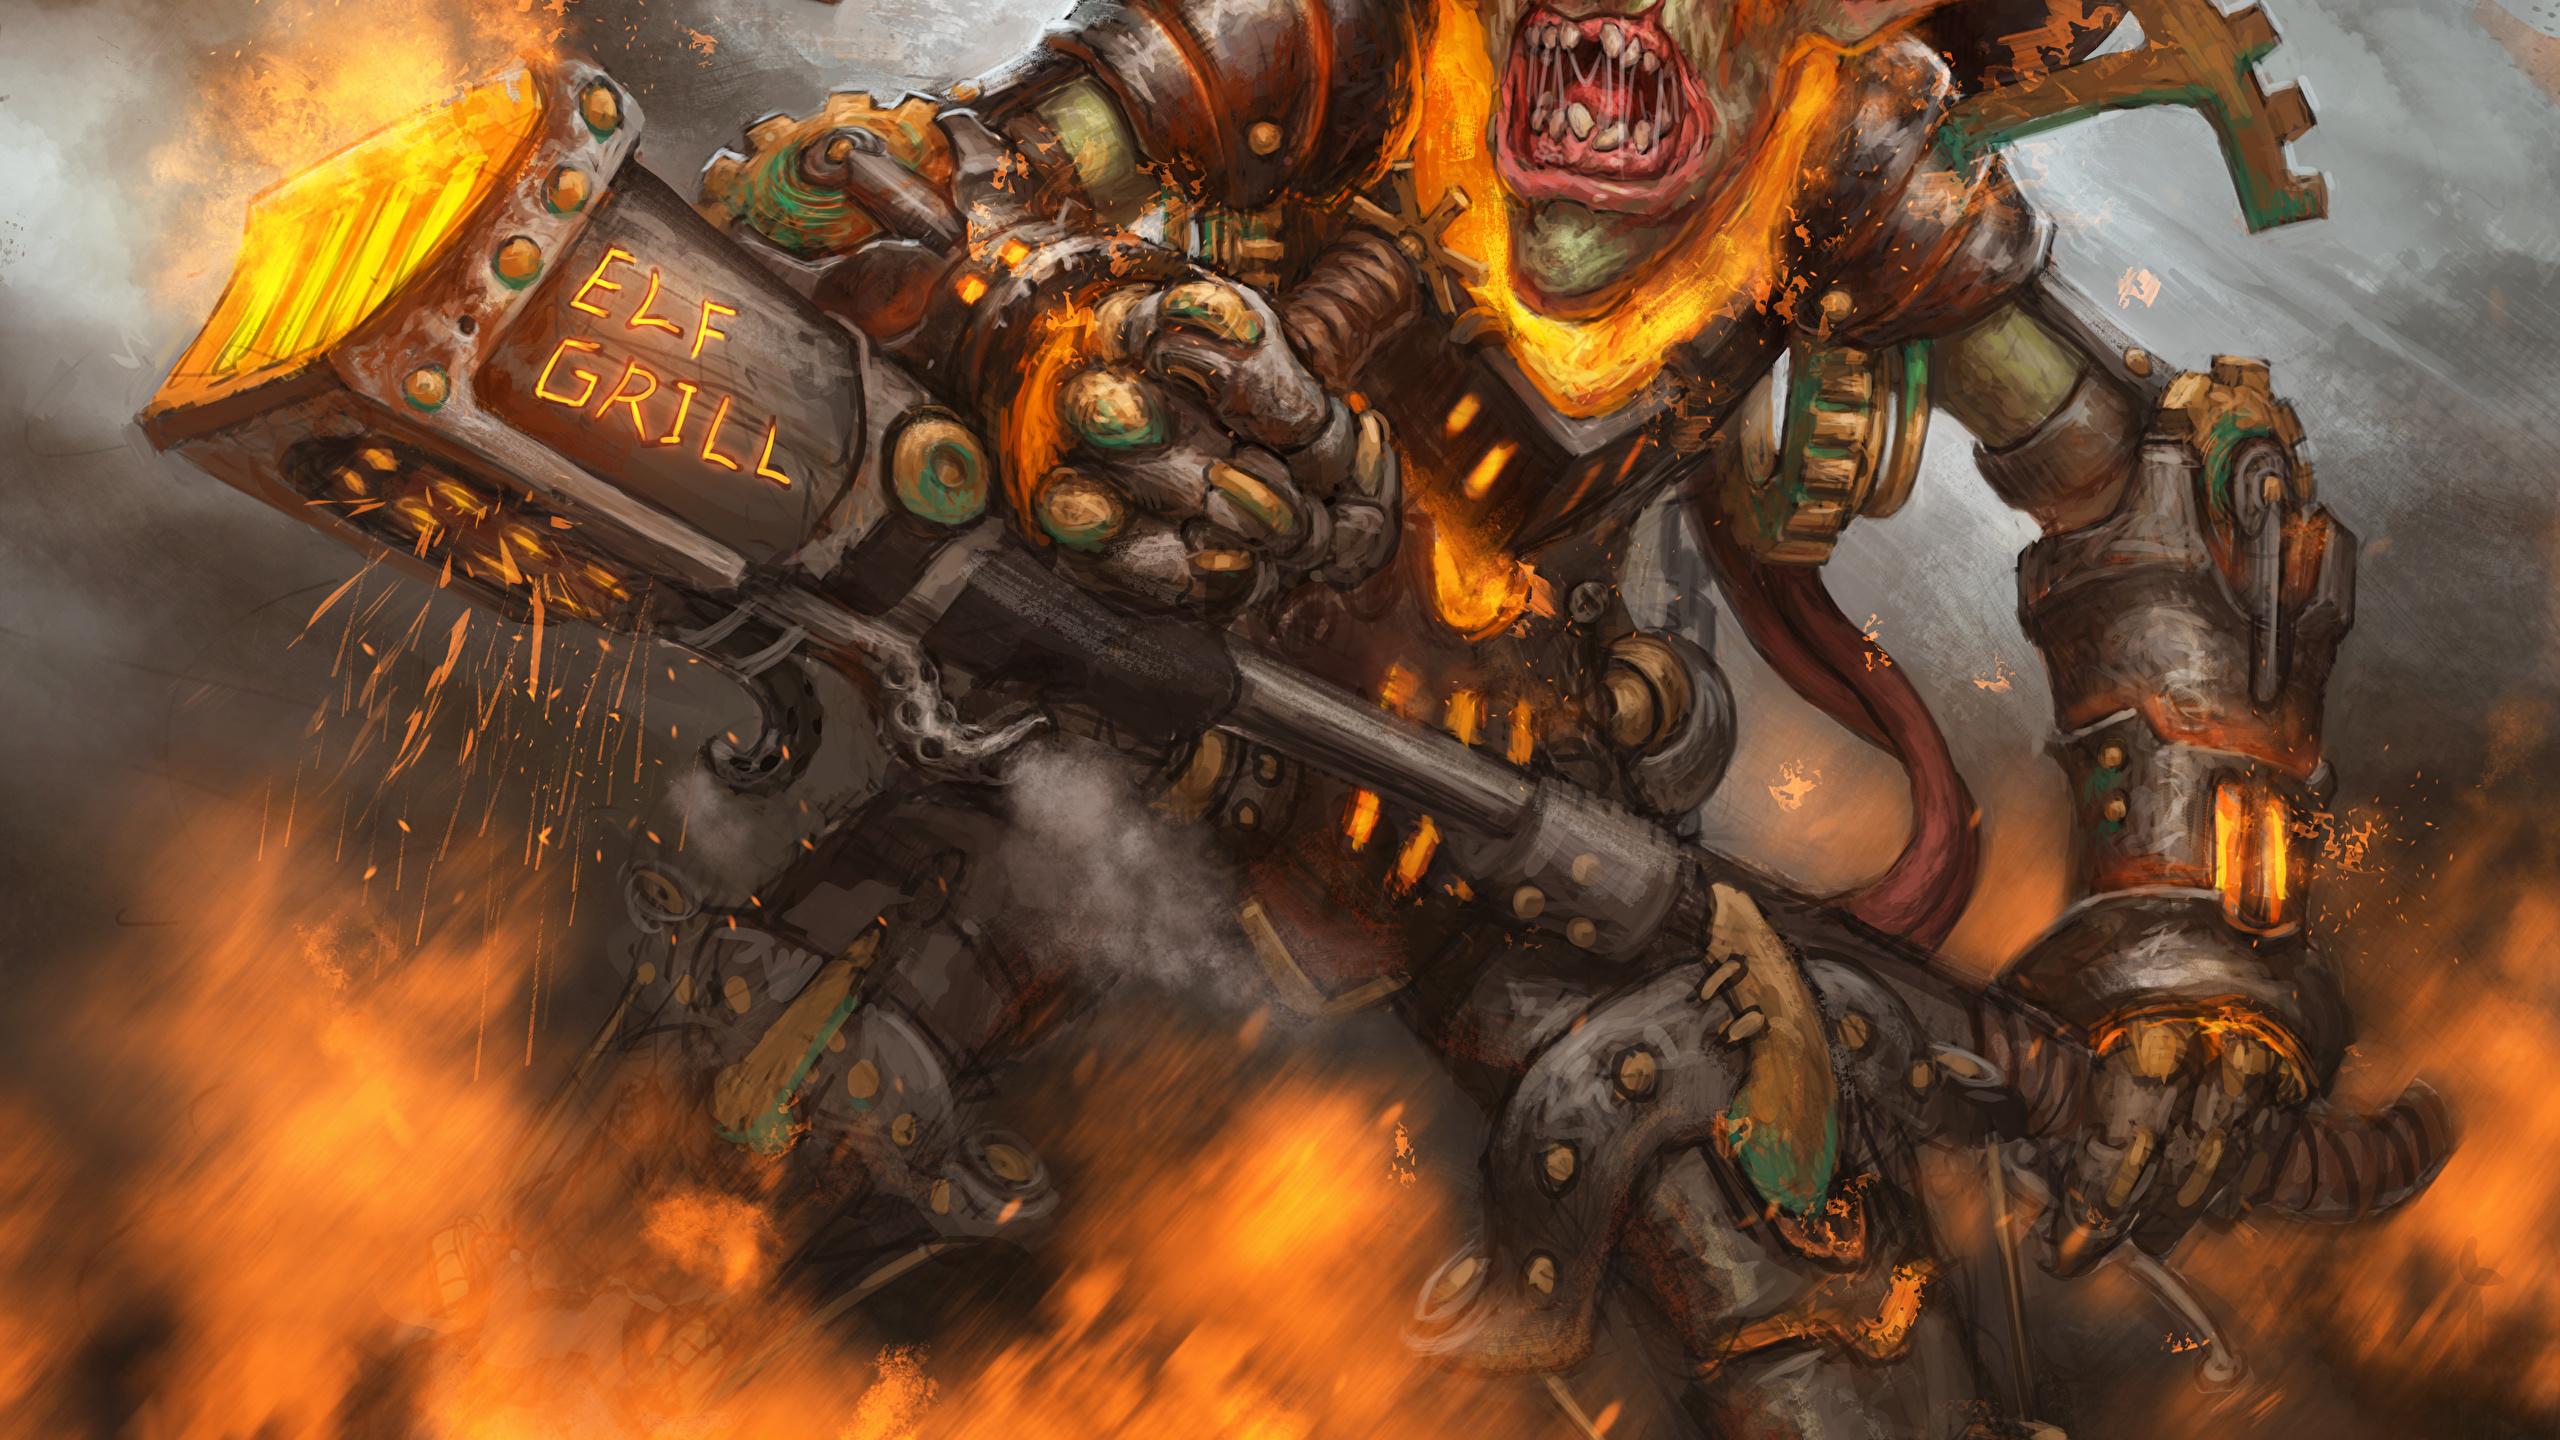 Image Hearthstone Heroes Of Warcraft Goblin Warrior 2560x1440